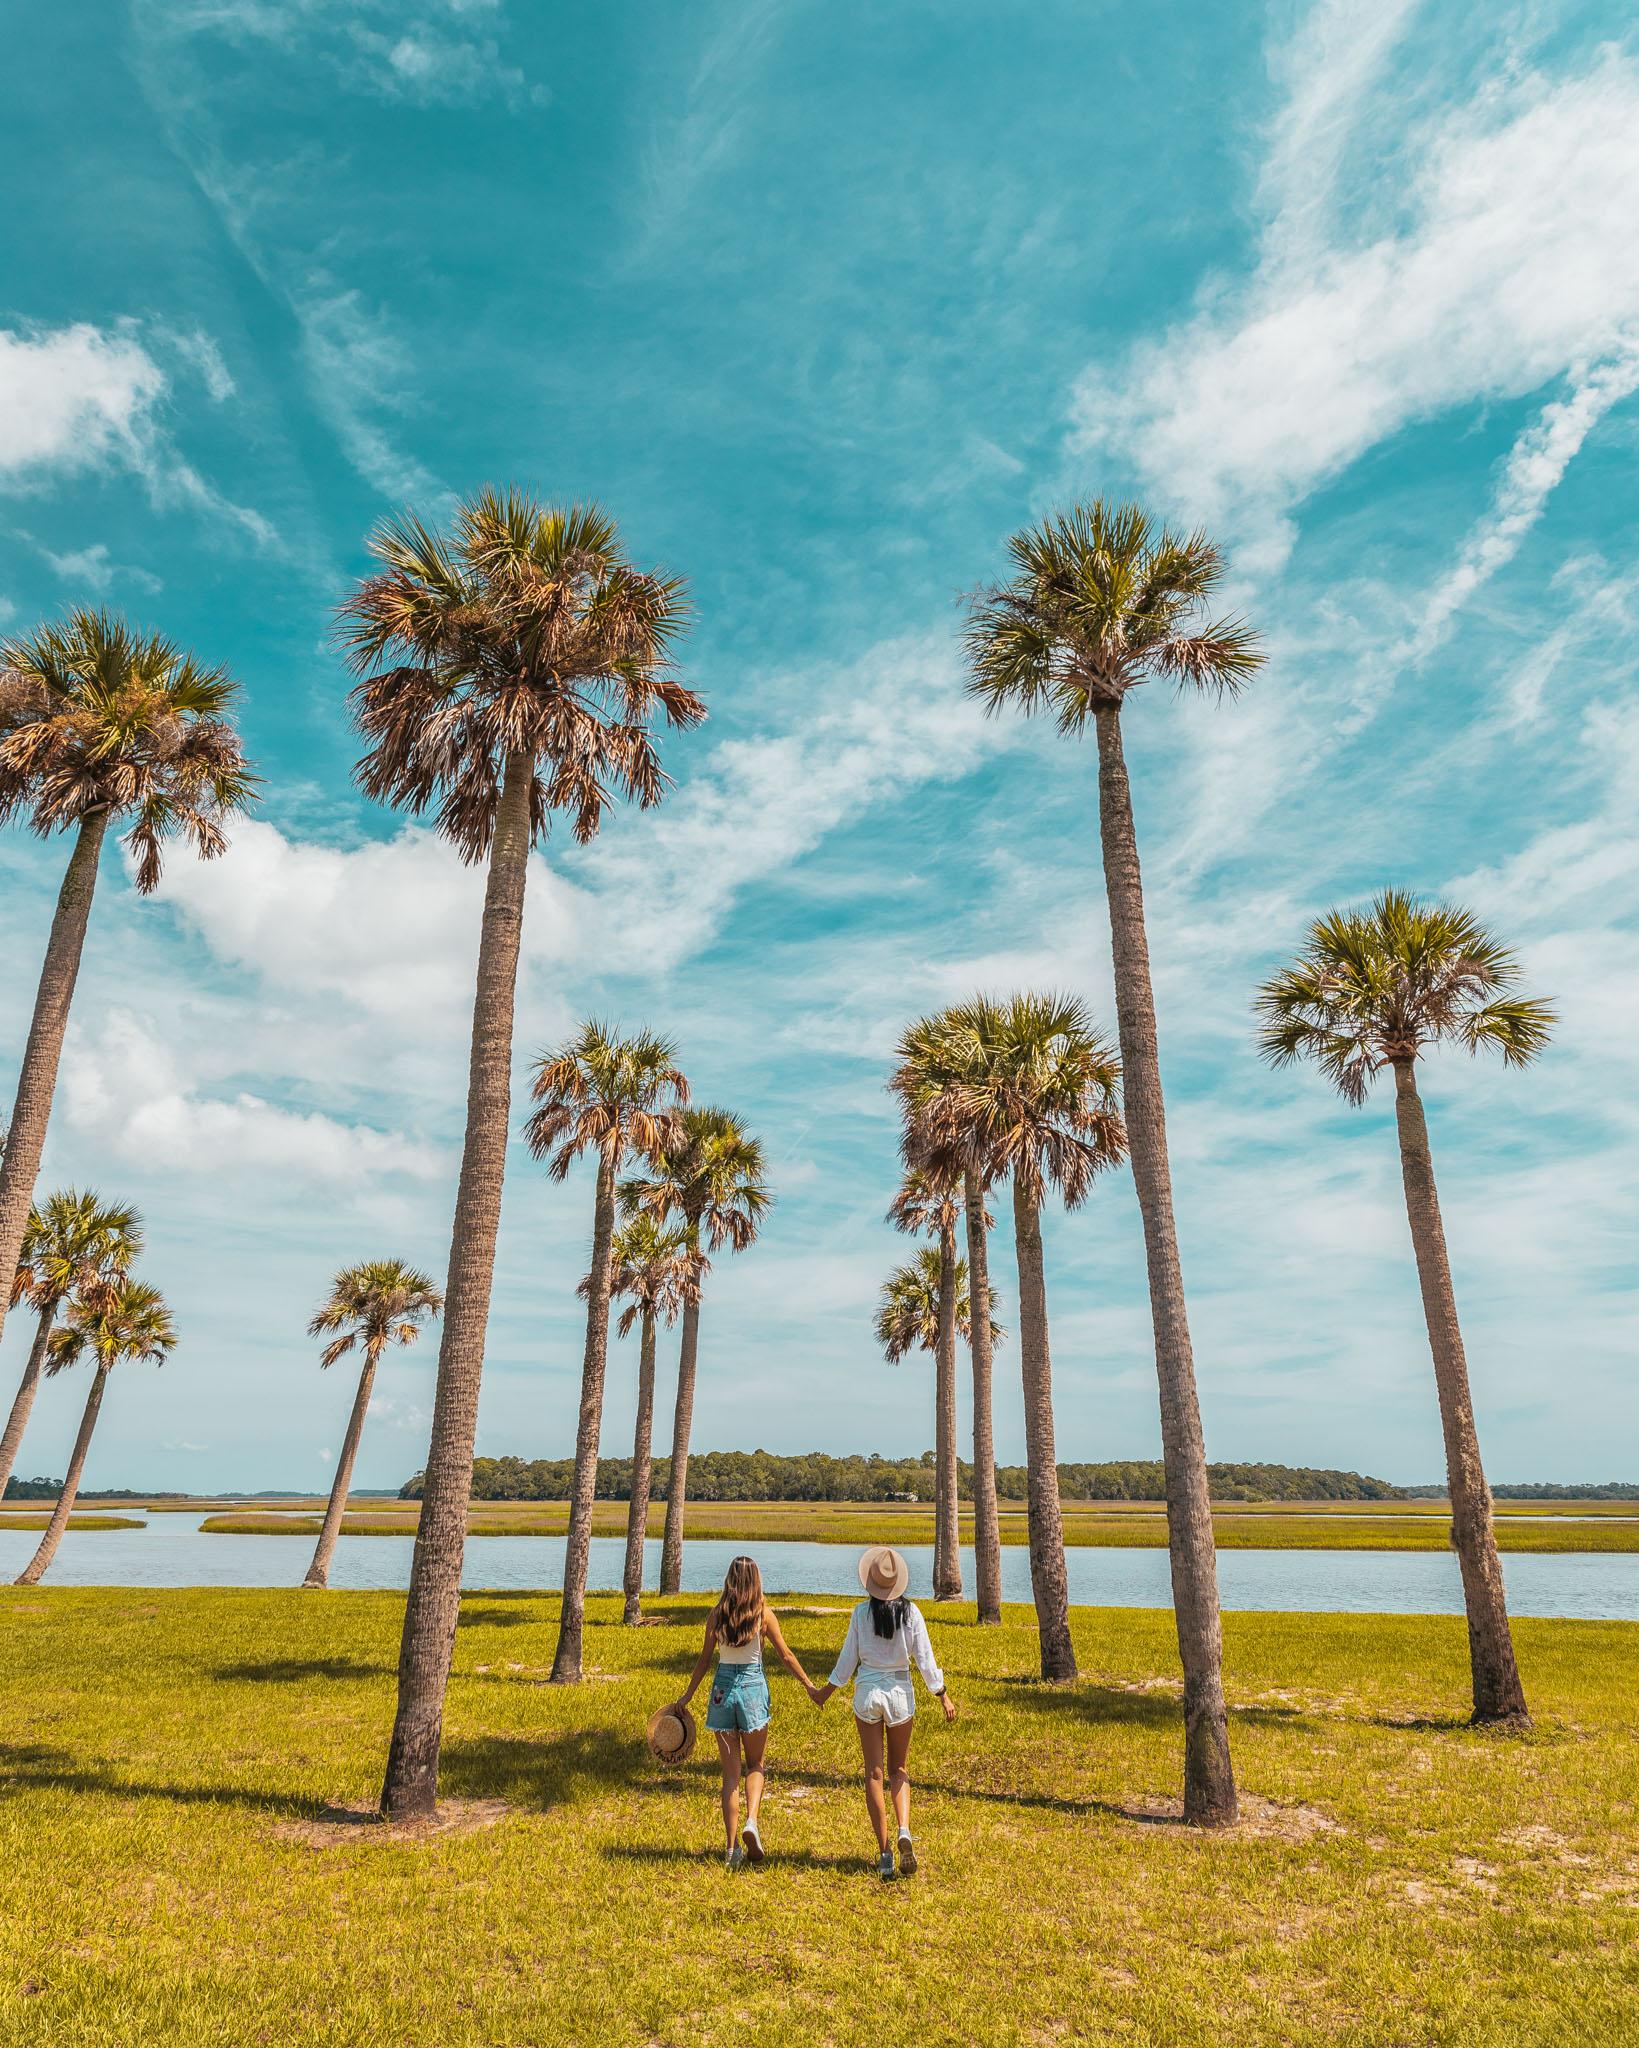 Kingsley Plantation ~ Top Things to Do in Jacksonville, Florida ~ #readysetjetset #florida #jax #jacksonville #blogpost #travel